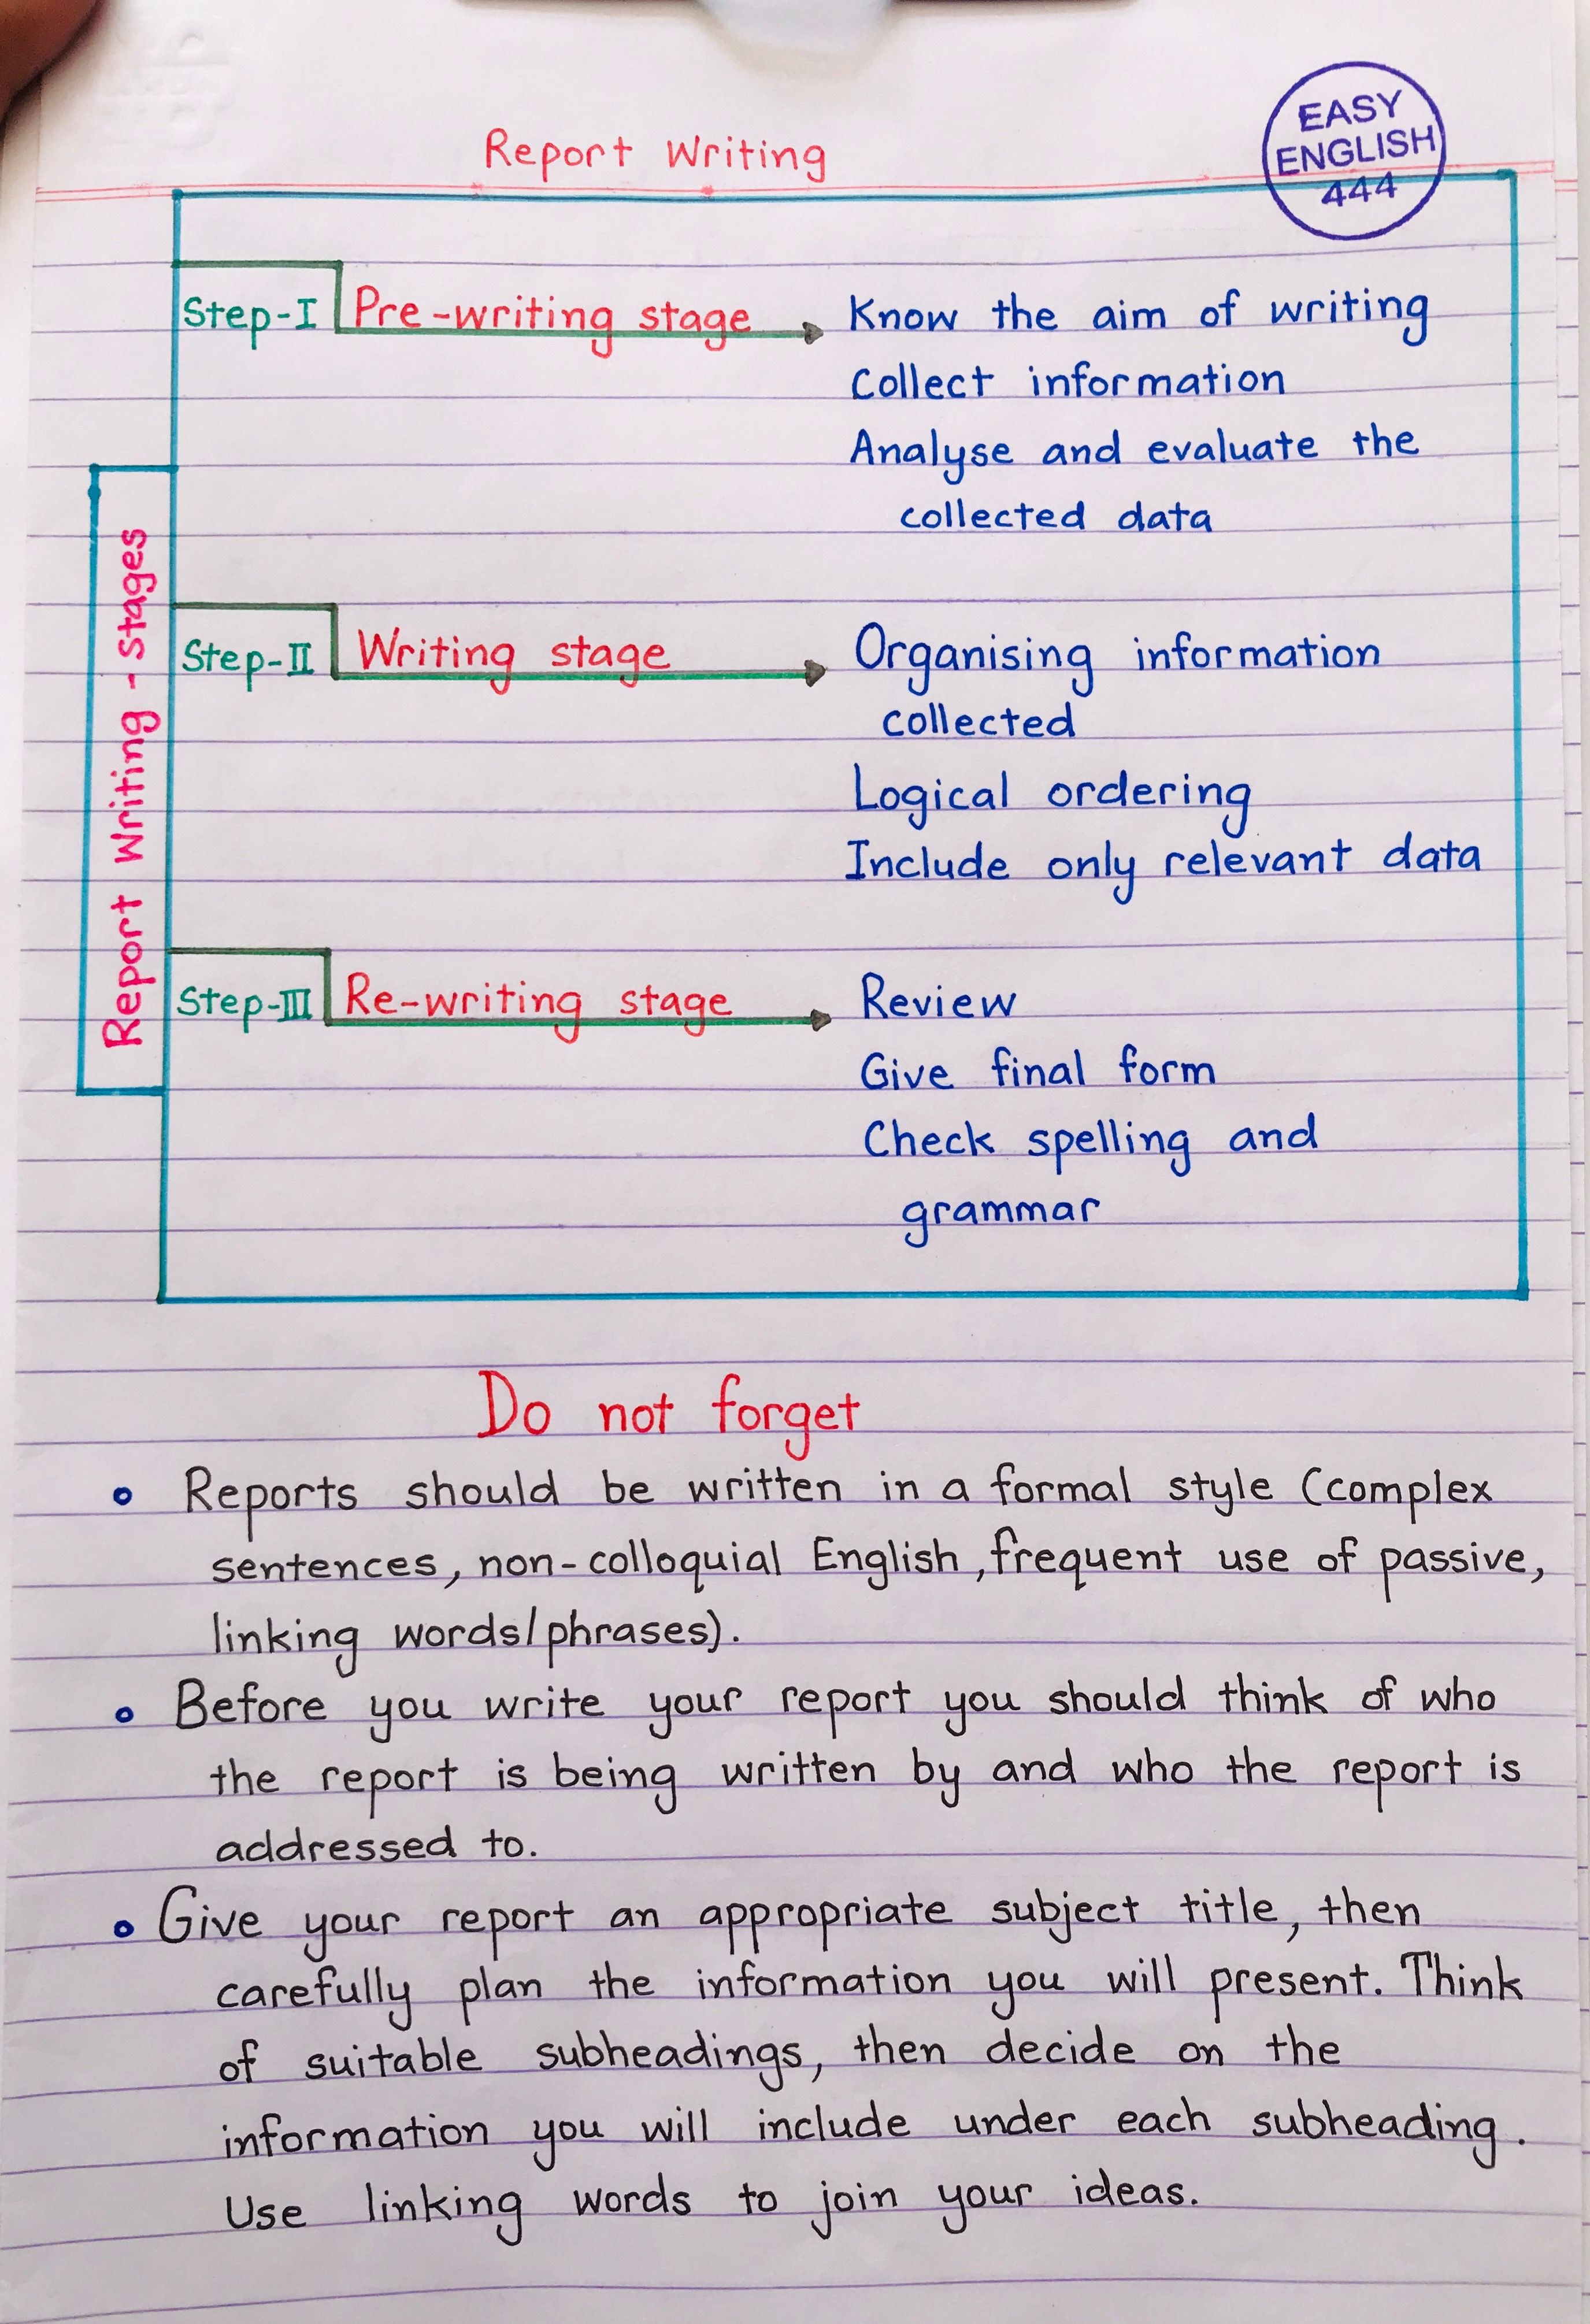 writing  English writing skills, English writing, Learn english words